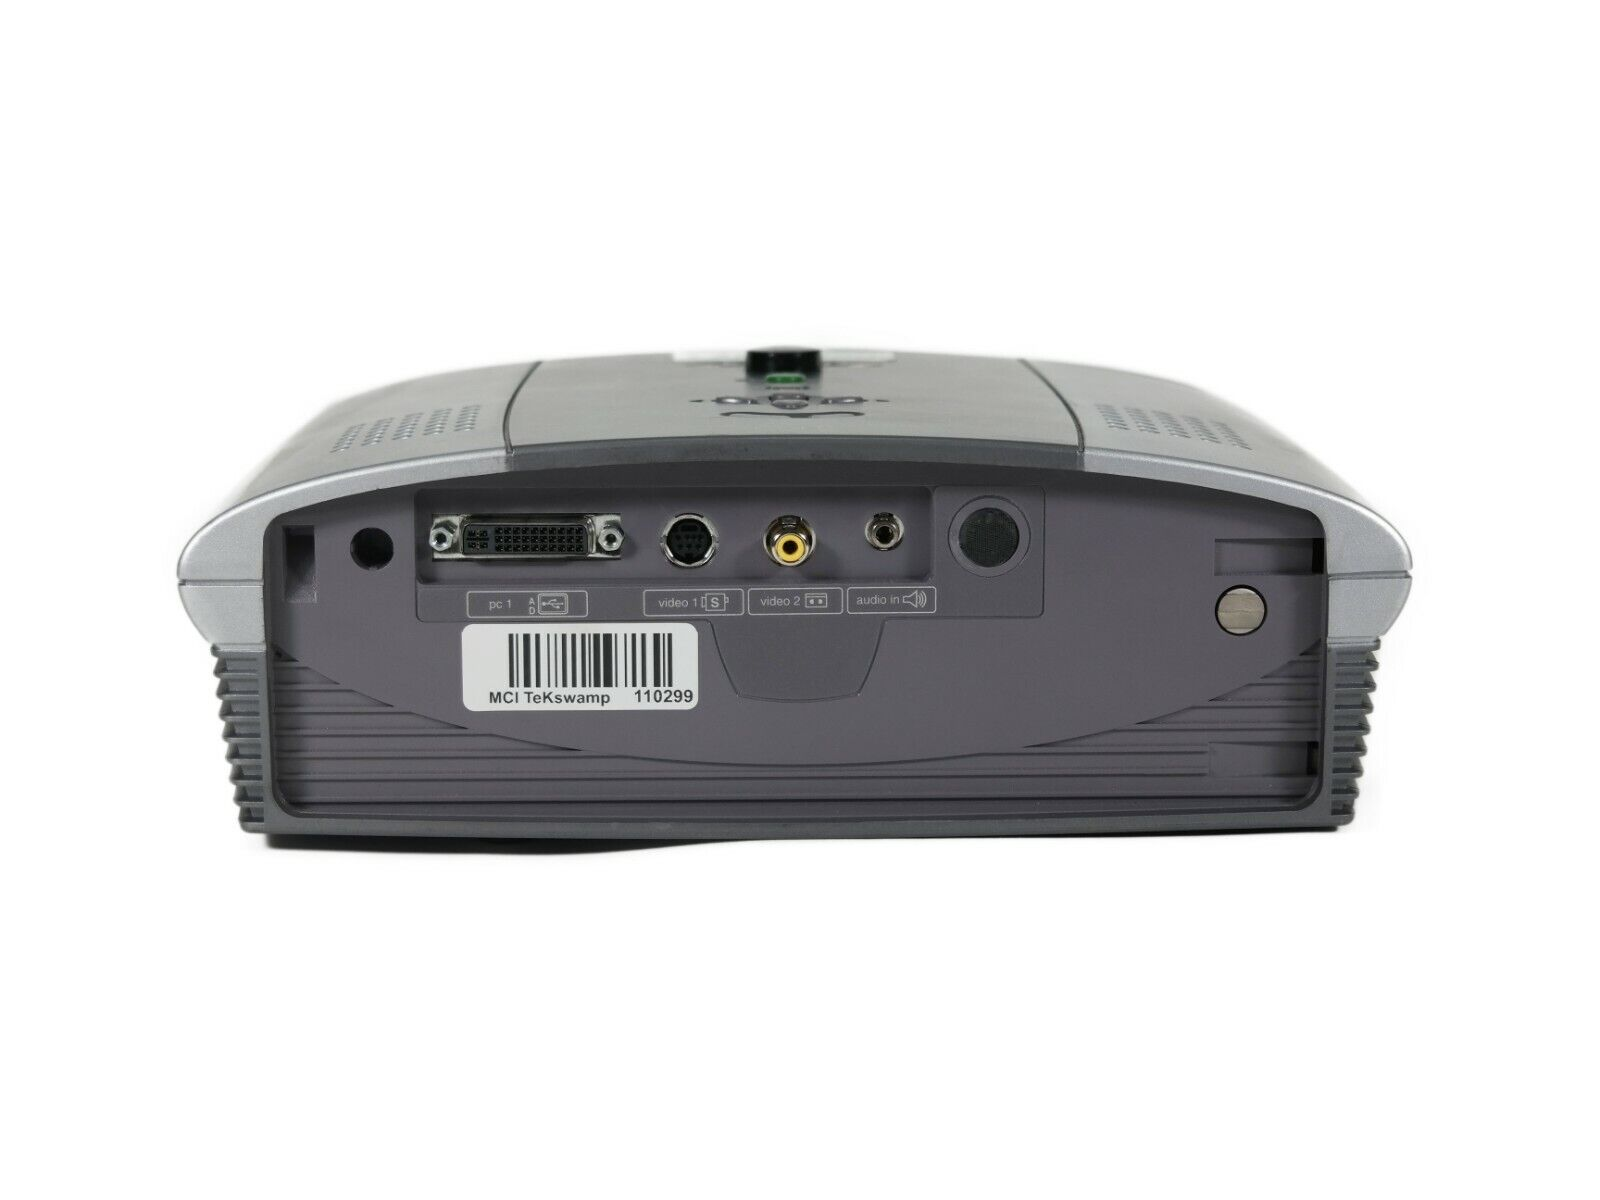 InFocus LP500 Projector 800x600 No Remote